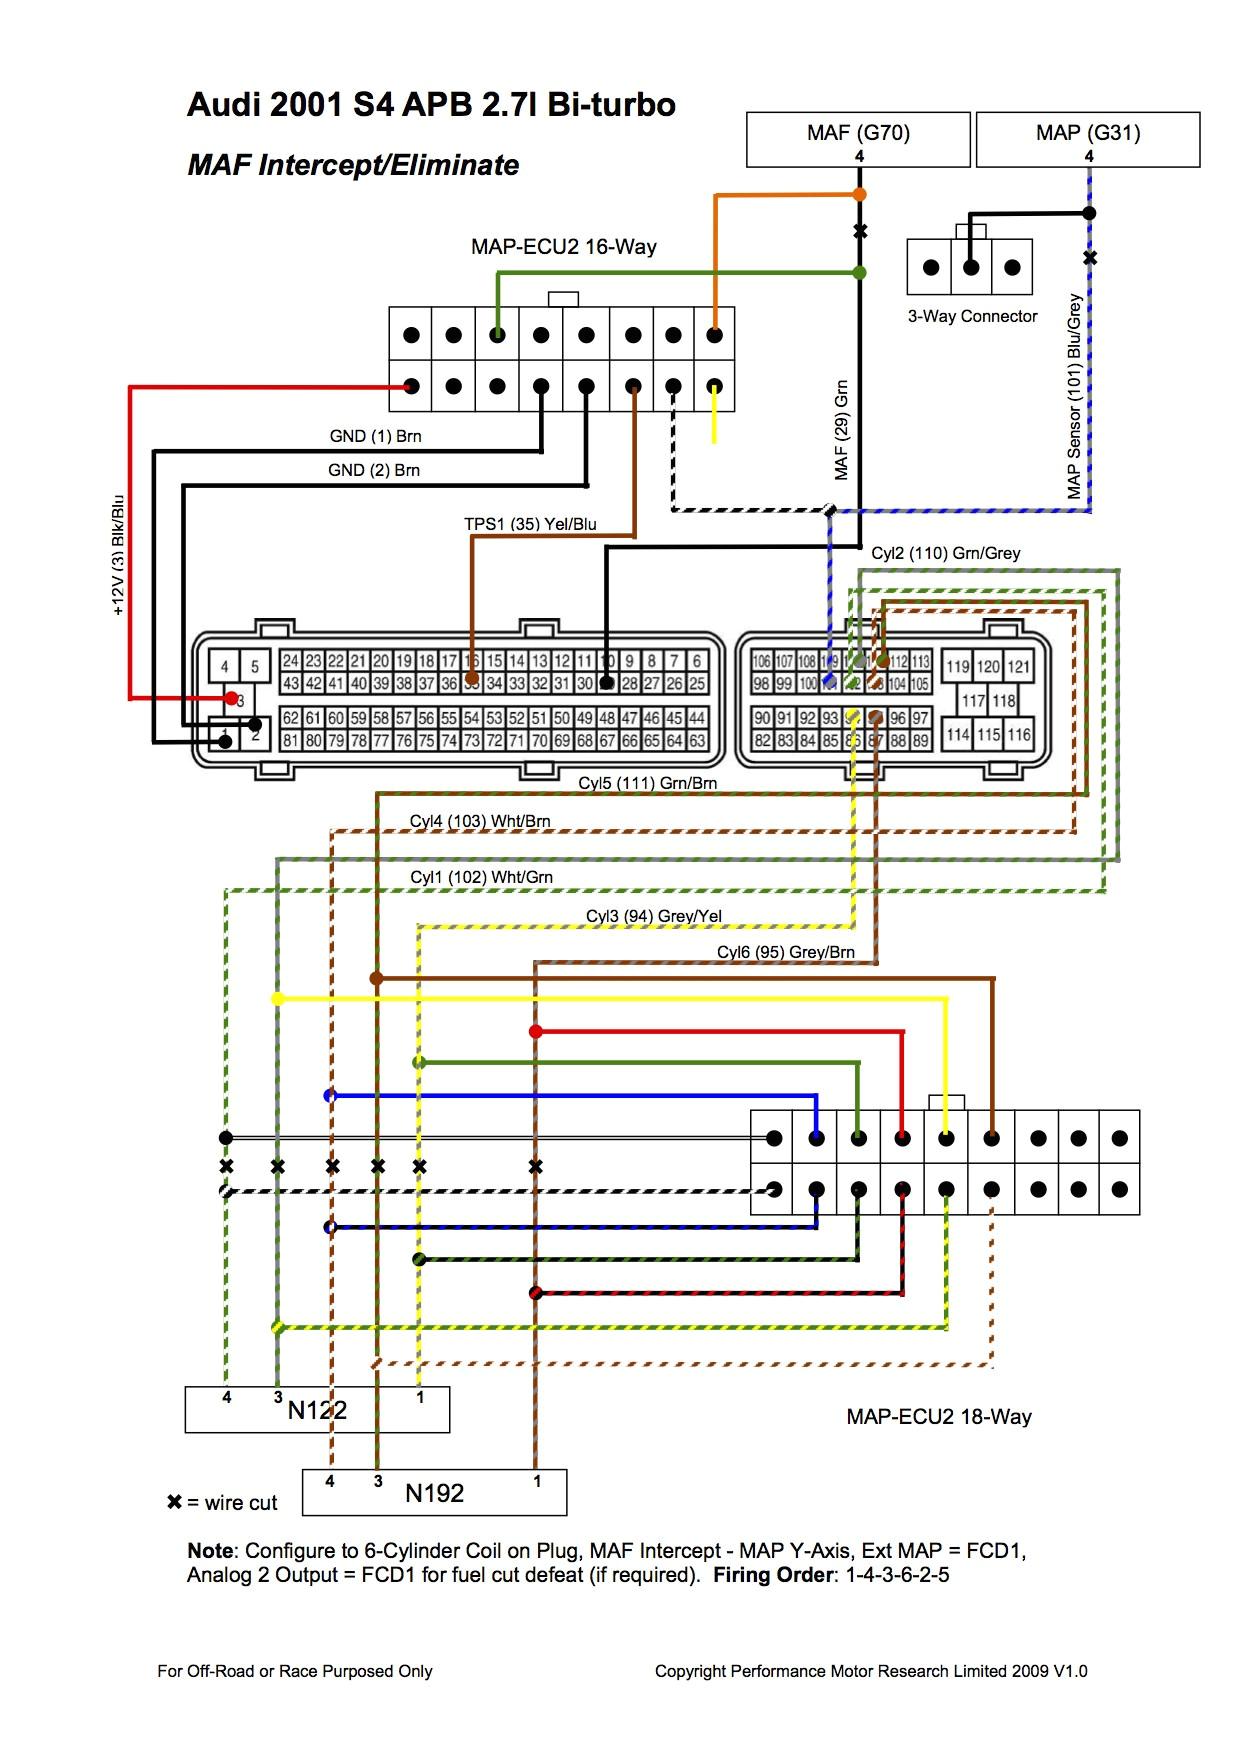 wiring diagram as well dodge ram 1500 on 2002 dodge ram 1500 power 02 dodge ram trans wiring diagram